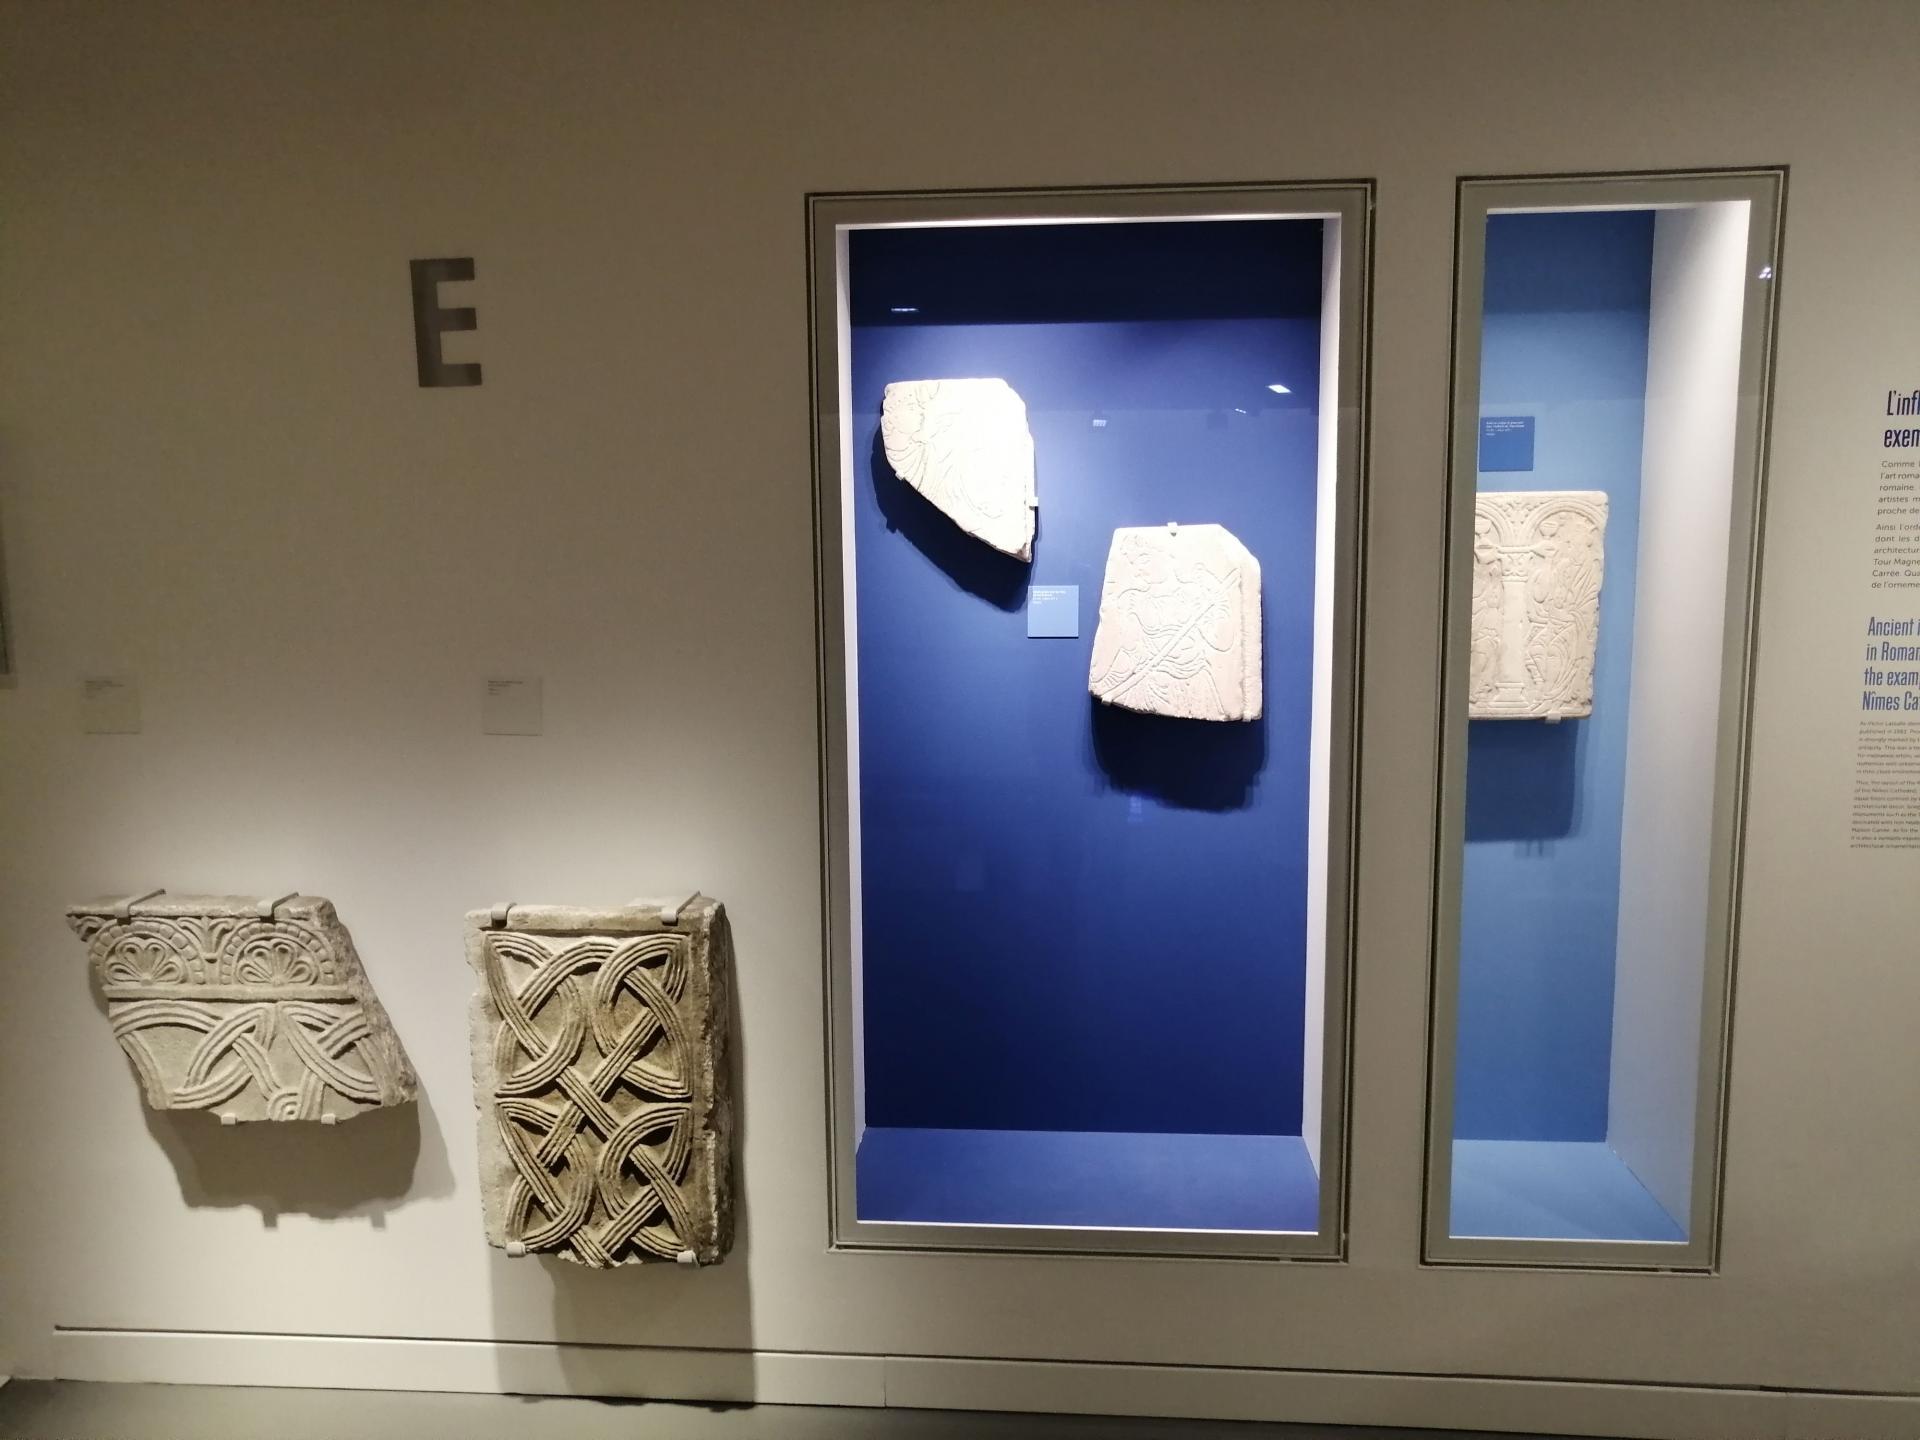 Musee de la romanite 21